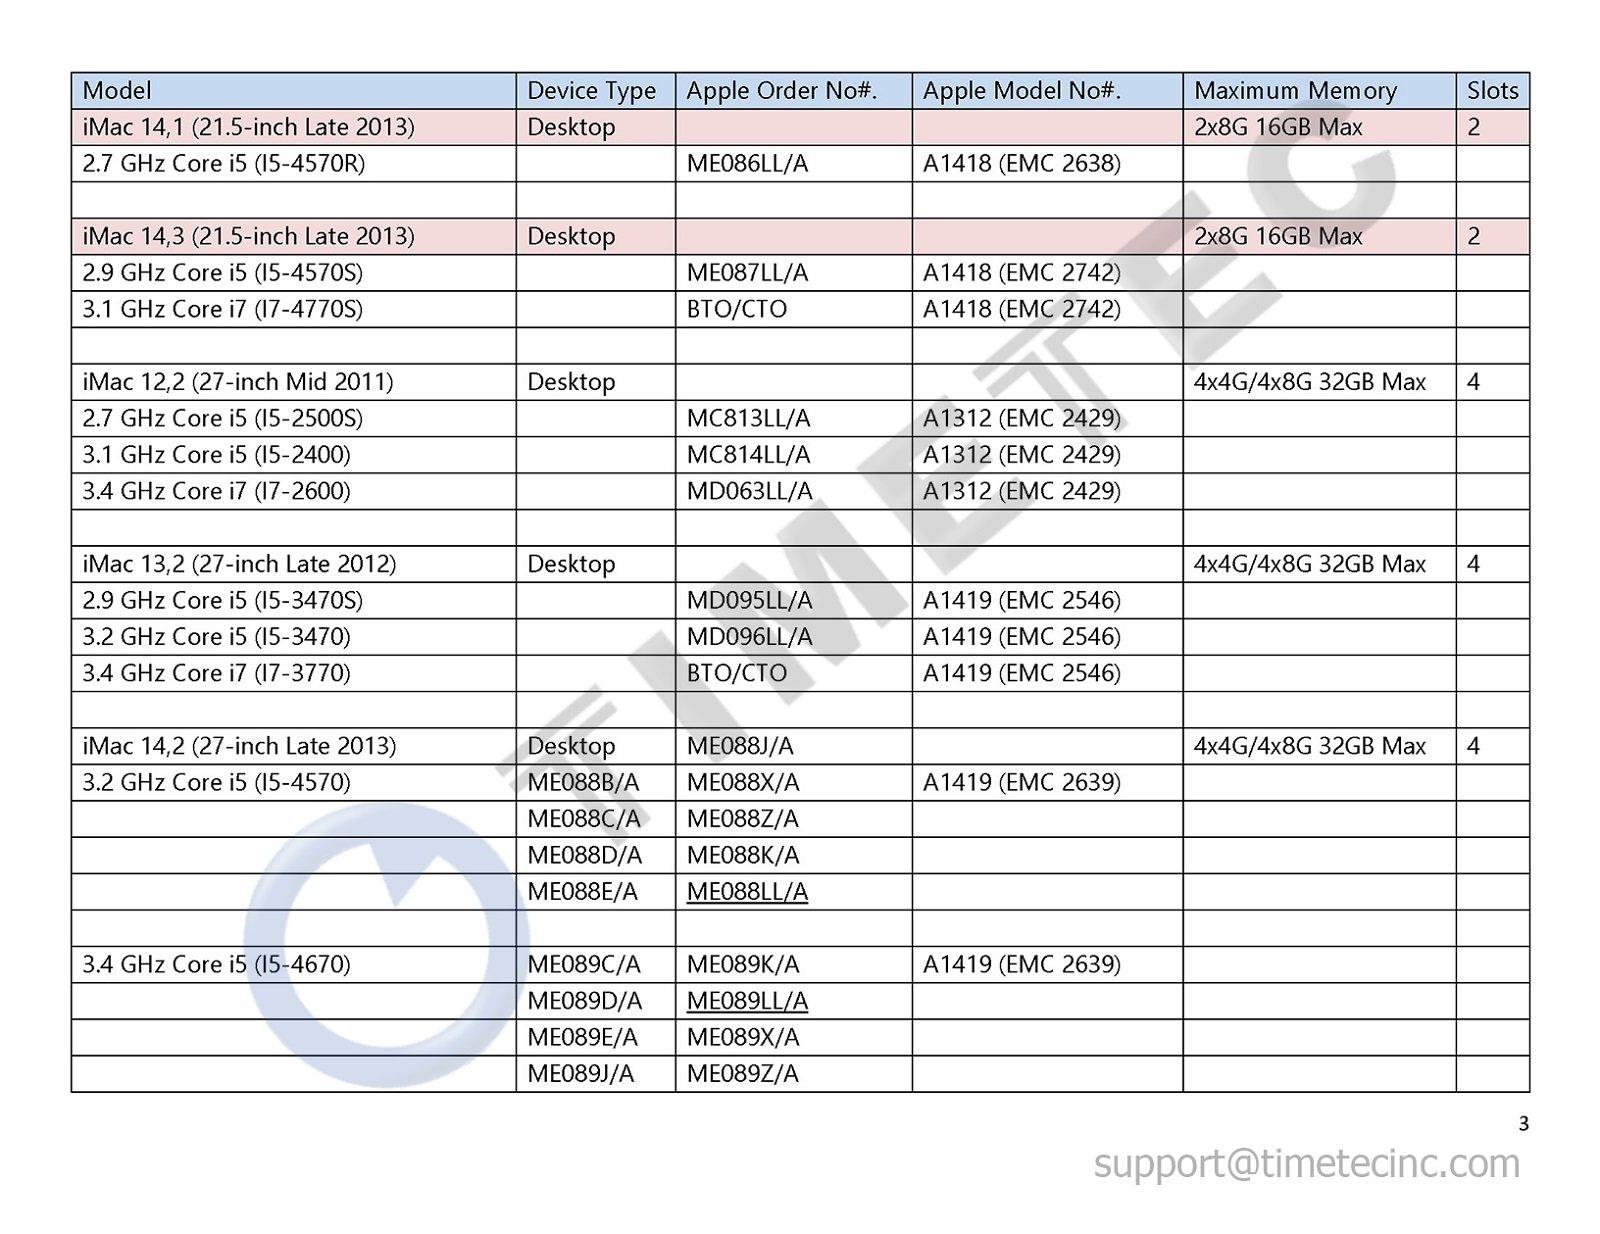 Timetec Hynix IC Apple 16GB Kit (2x8GB) DDR3L 1600MHz PC3L-12800 SODIMM Memory upgrade For MacBook Pro13-inch/15-inch Mid 2012, iMac 21.5-inch Late 2012/ Early/Late 2013(16GB Kit (2x8GB)) by Timetec (Image #4)